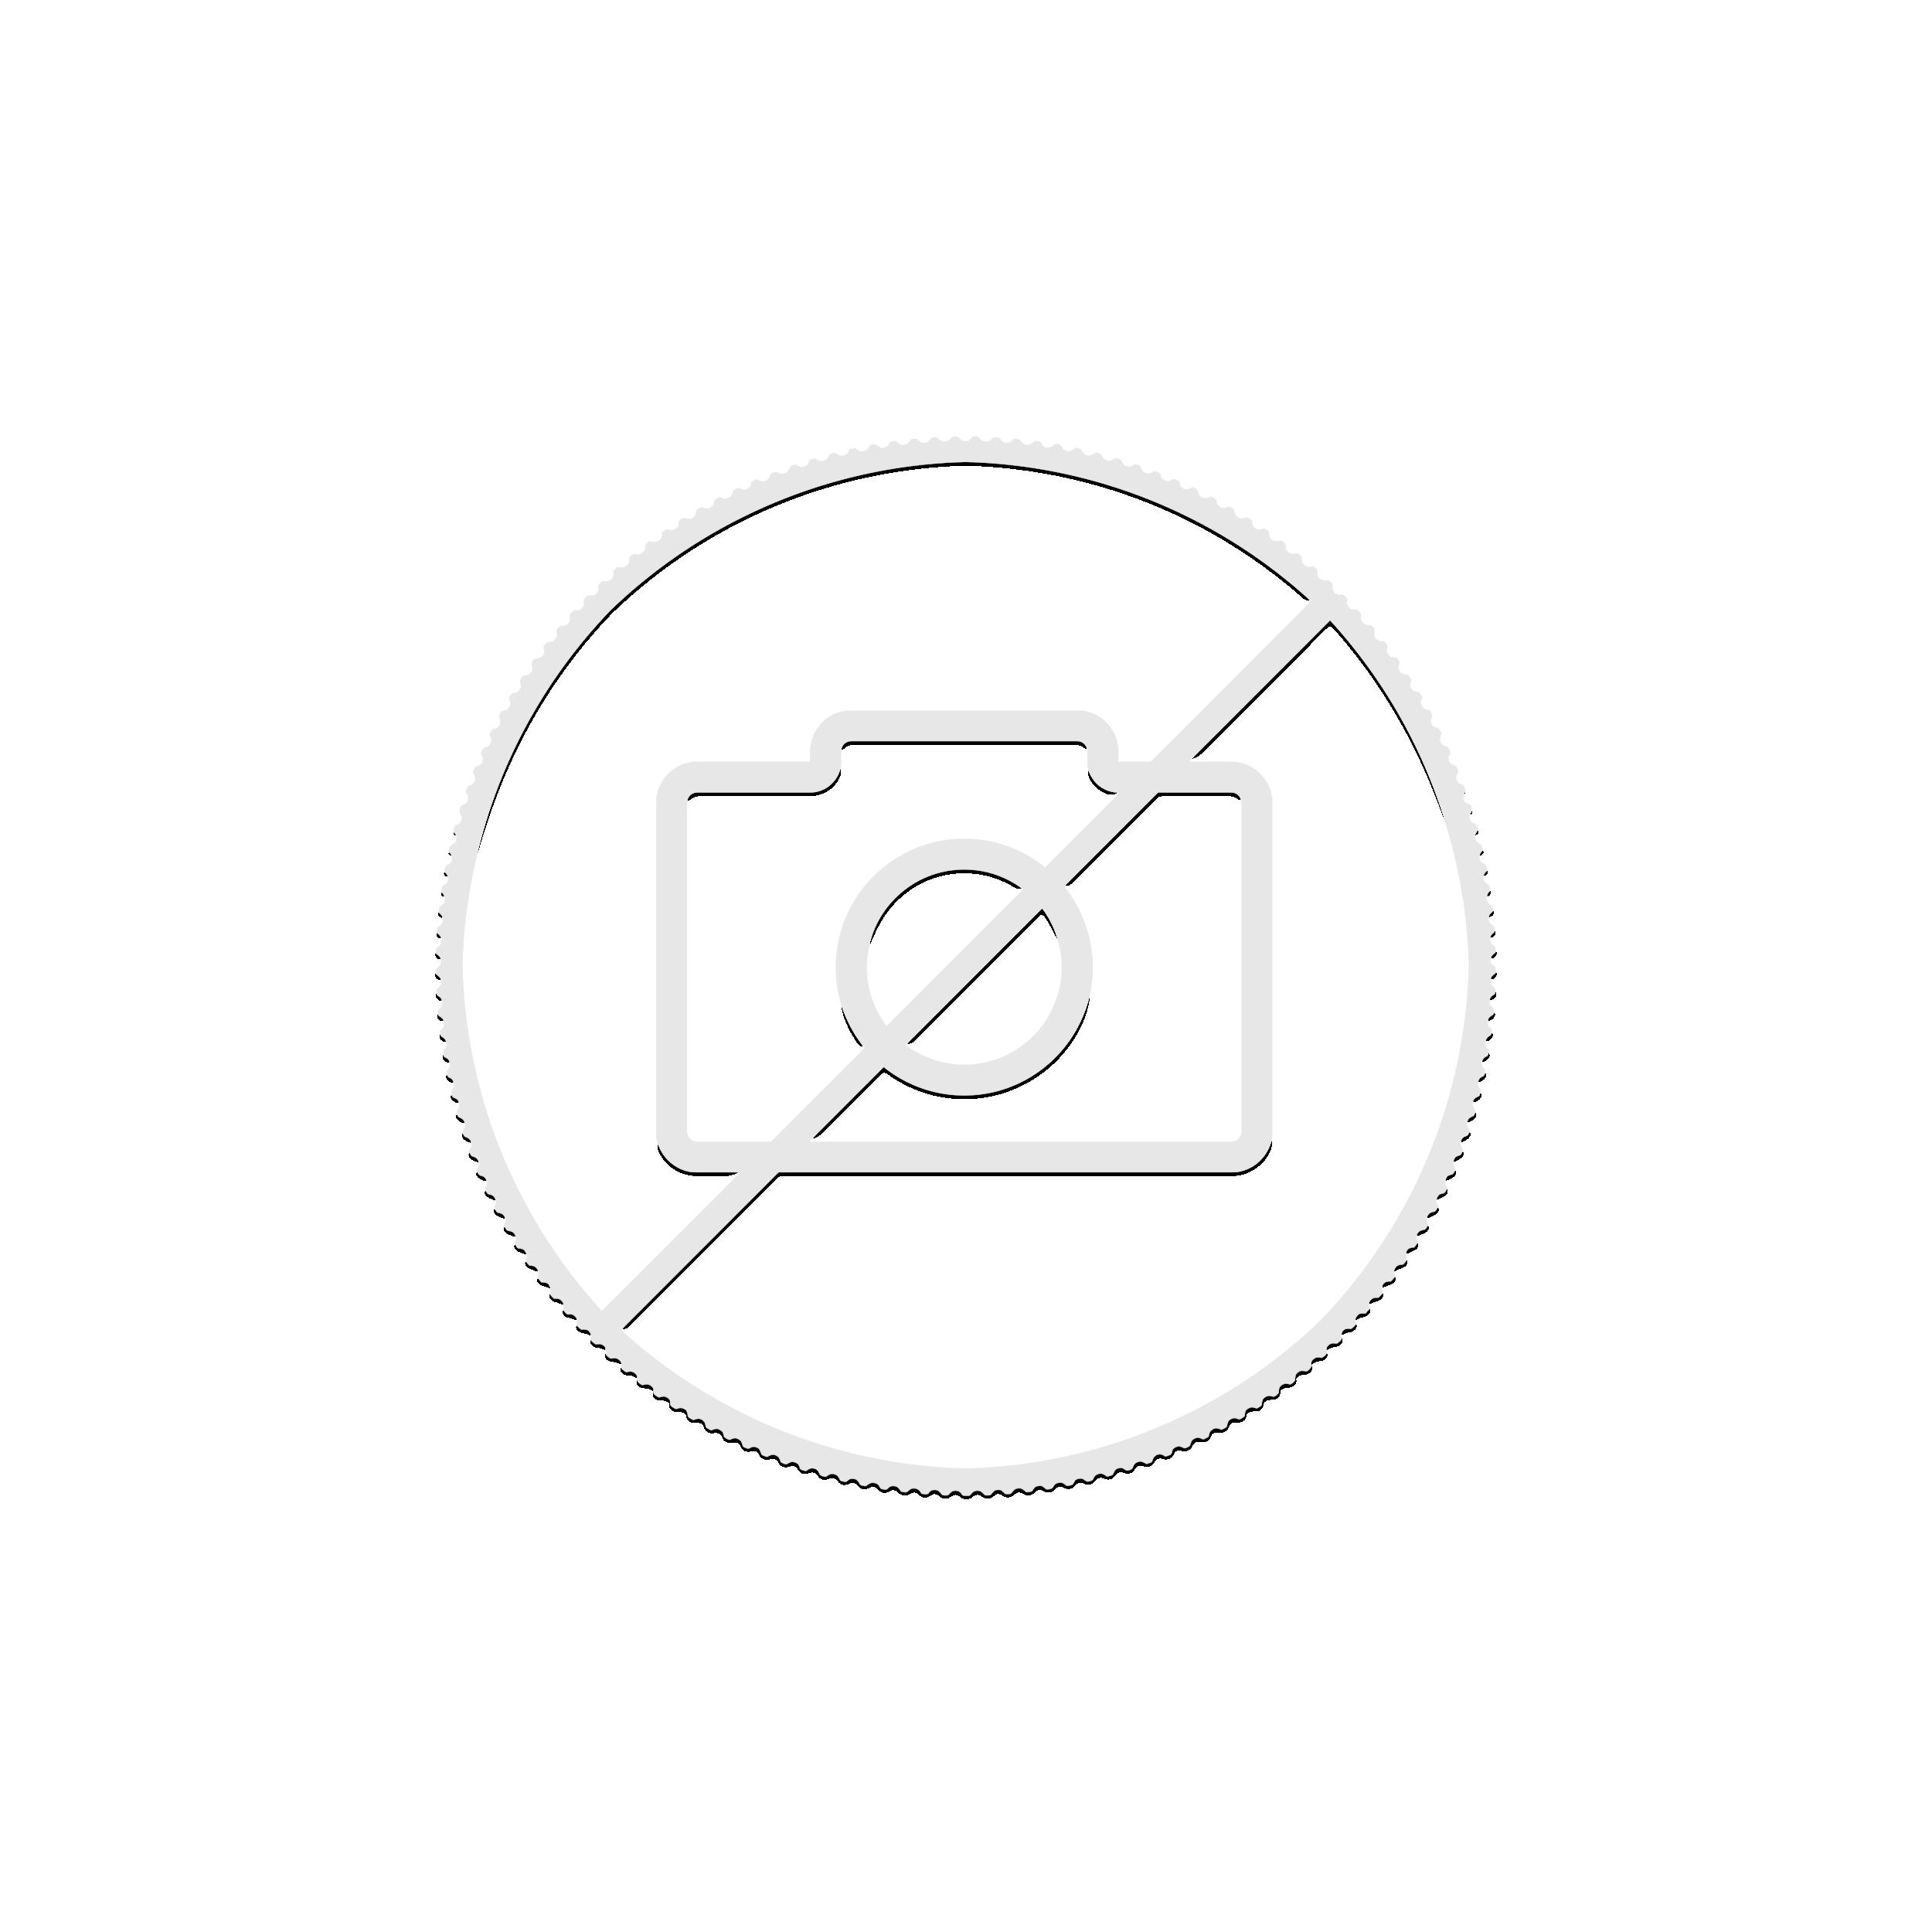 Chinese Drakenvaas zilveren munt 2021